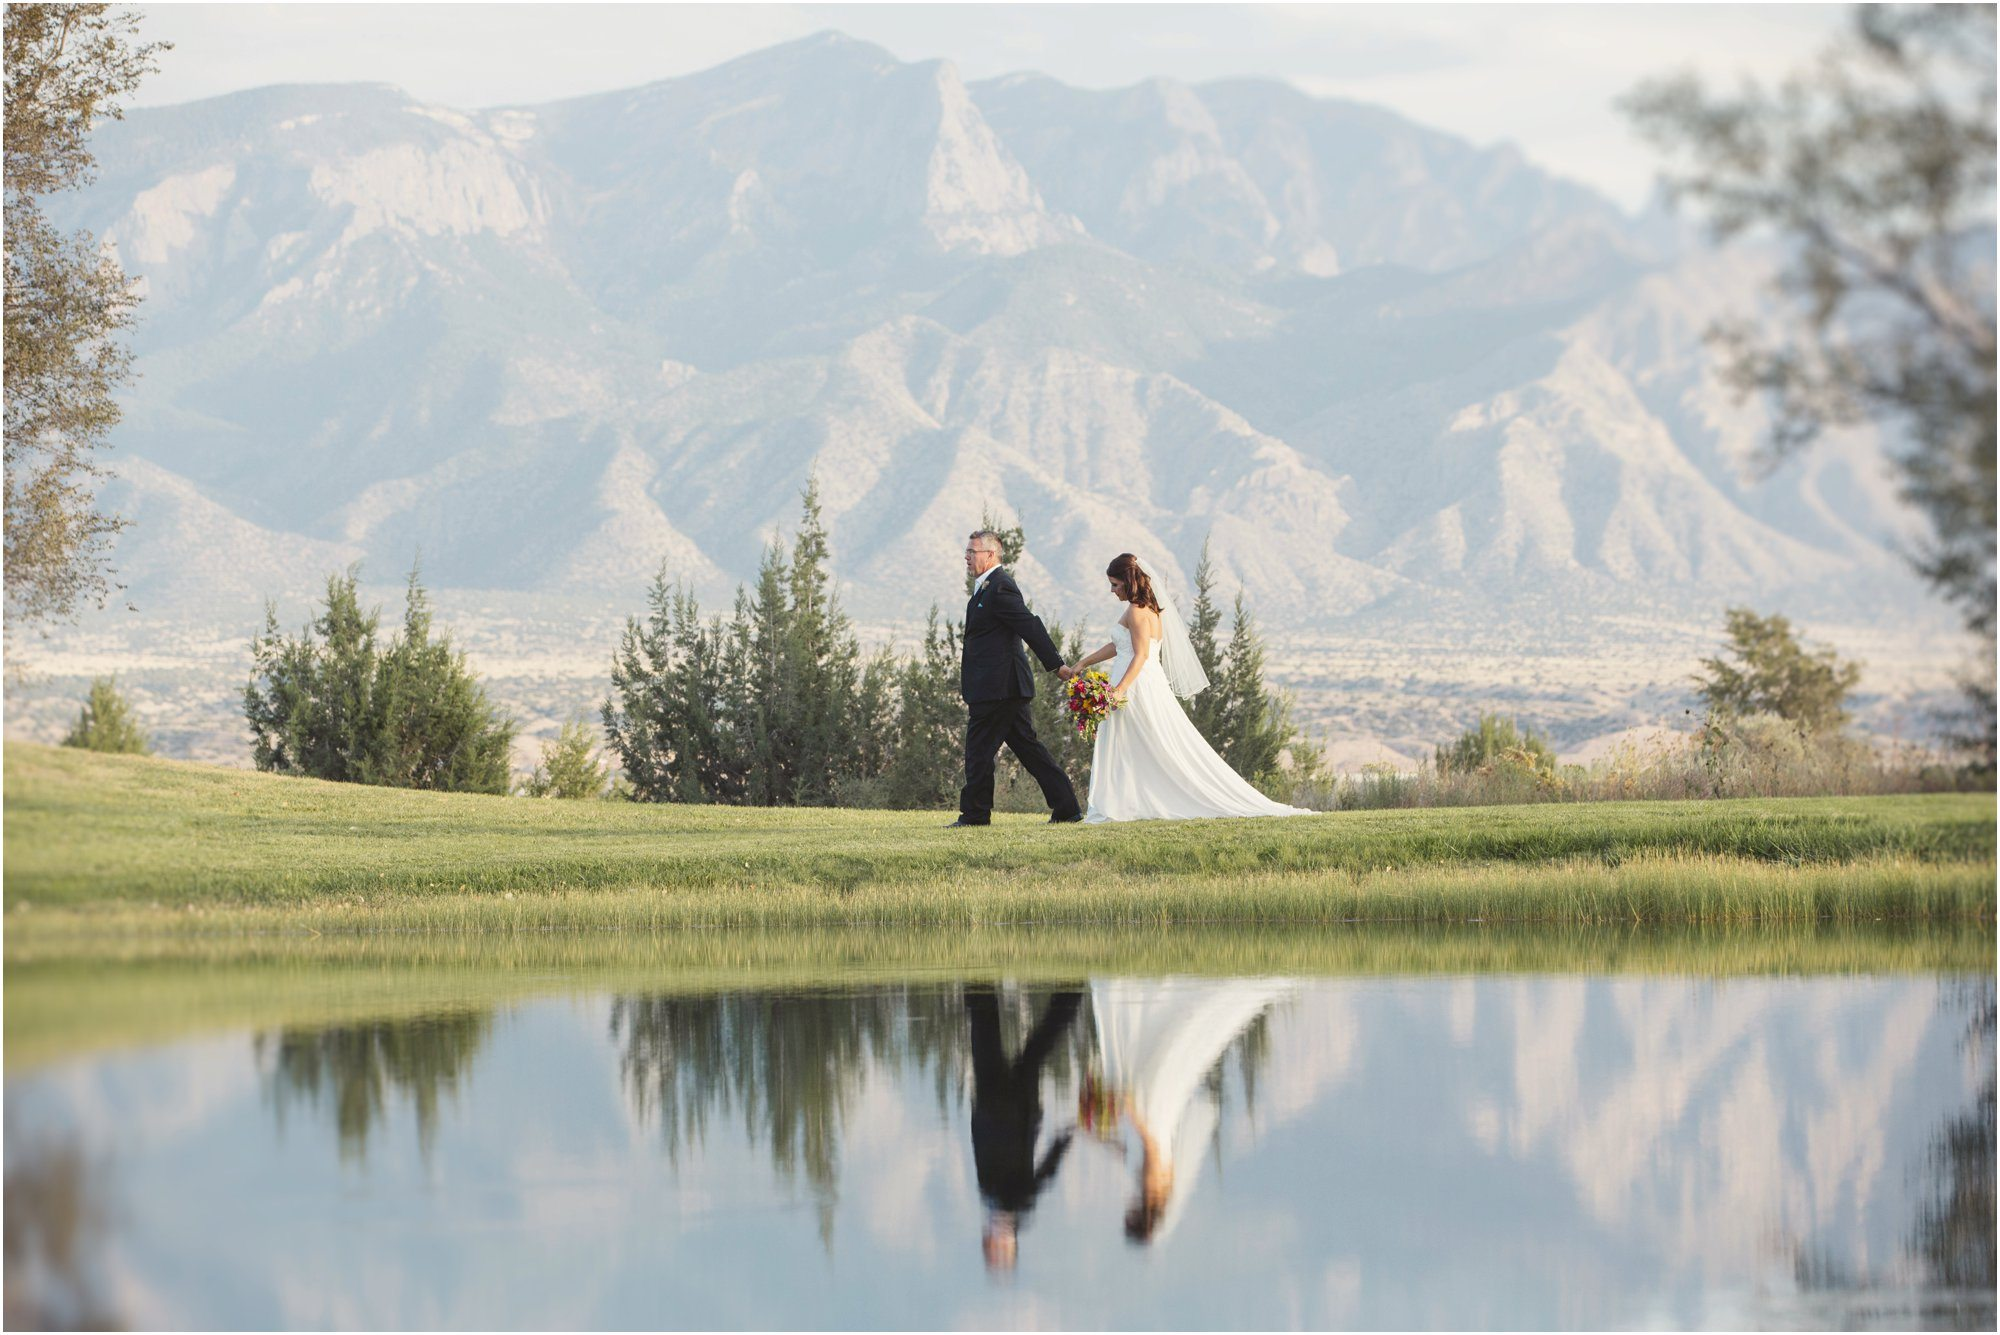 060BlueRosePhotography_ Albuquerque wedding photographers